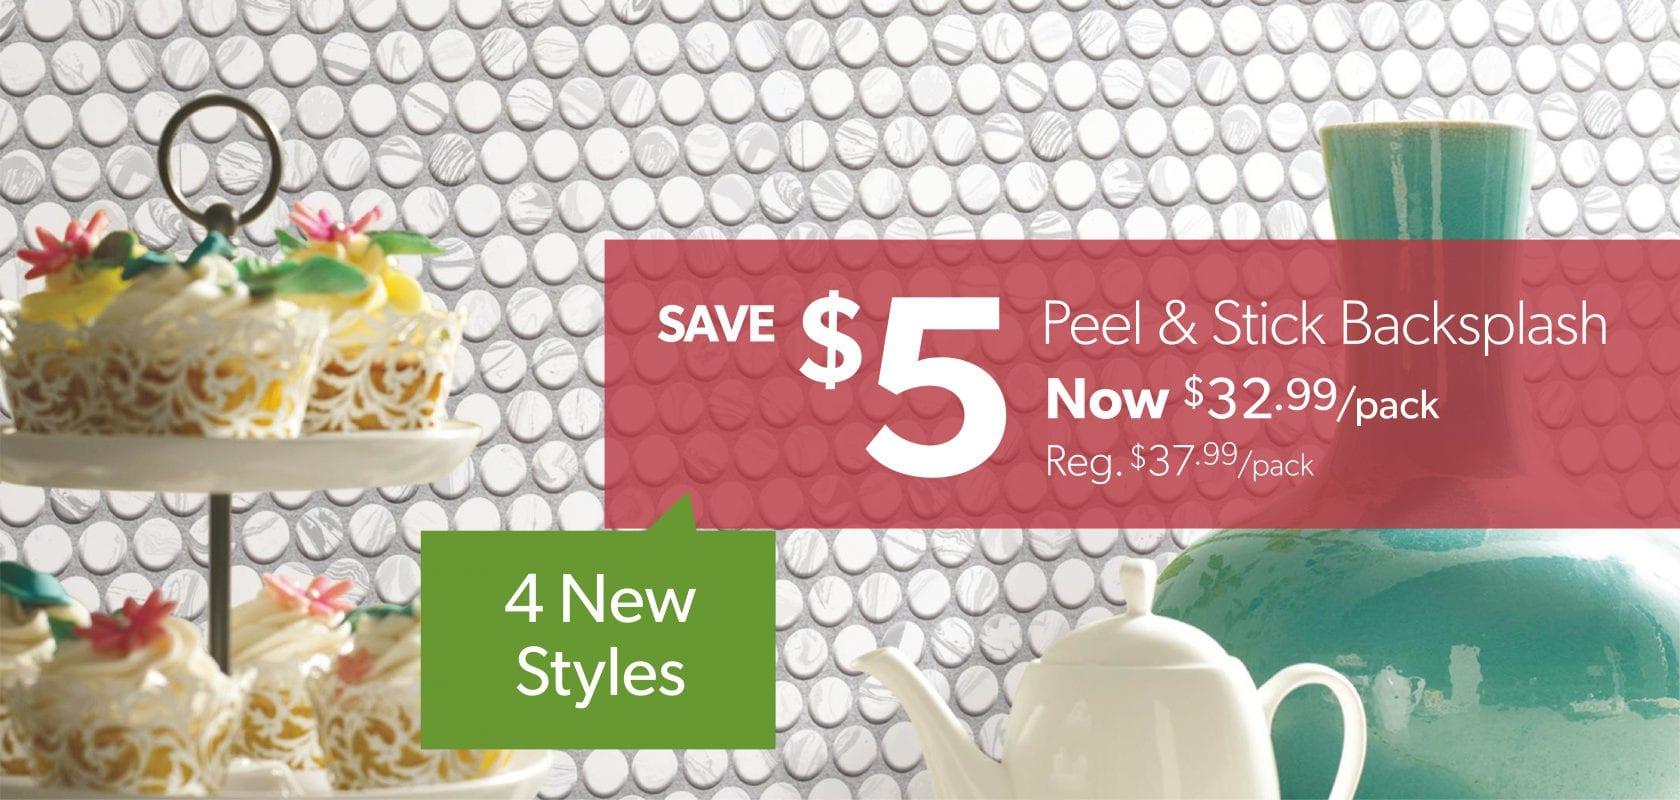 $5 off Peel & Stick Backsplash Tiles